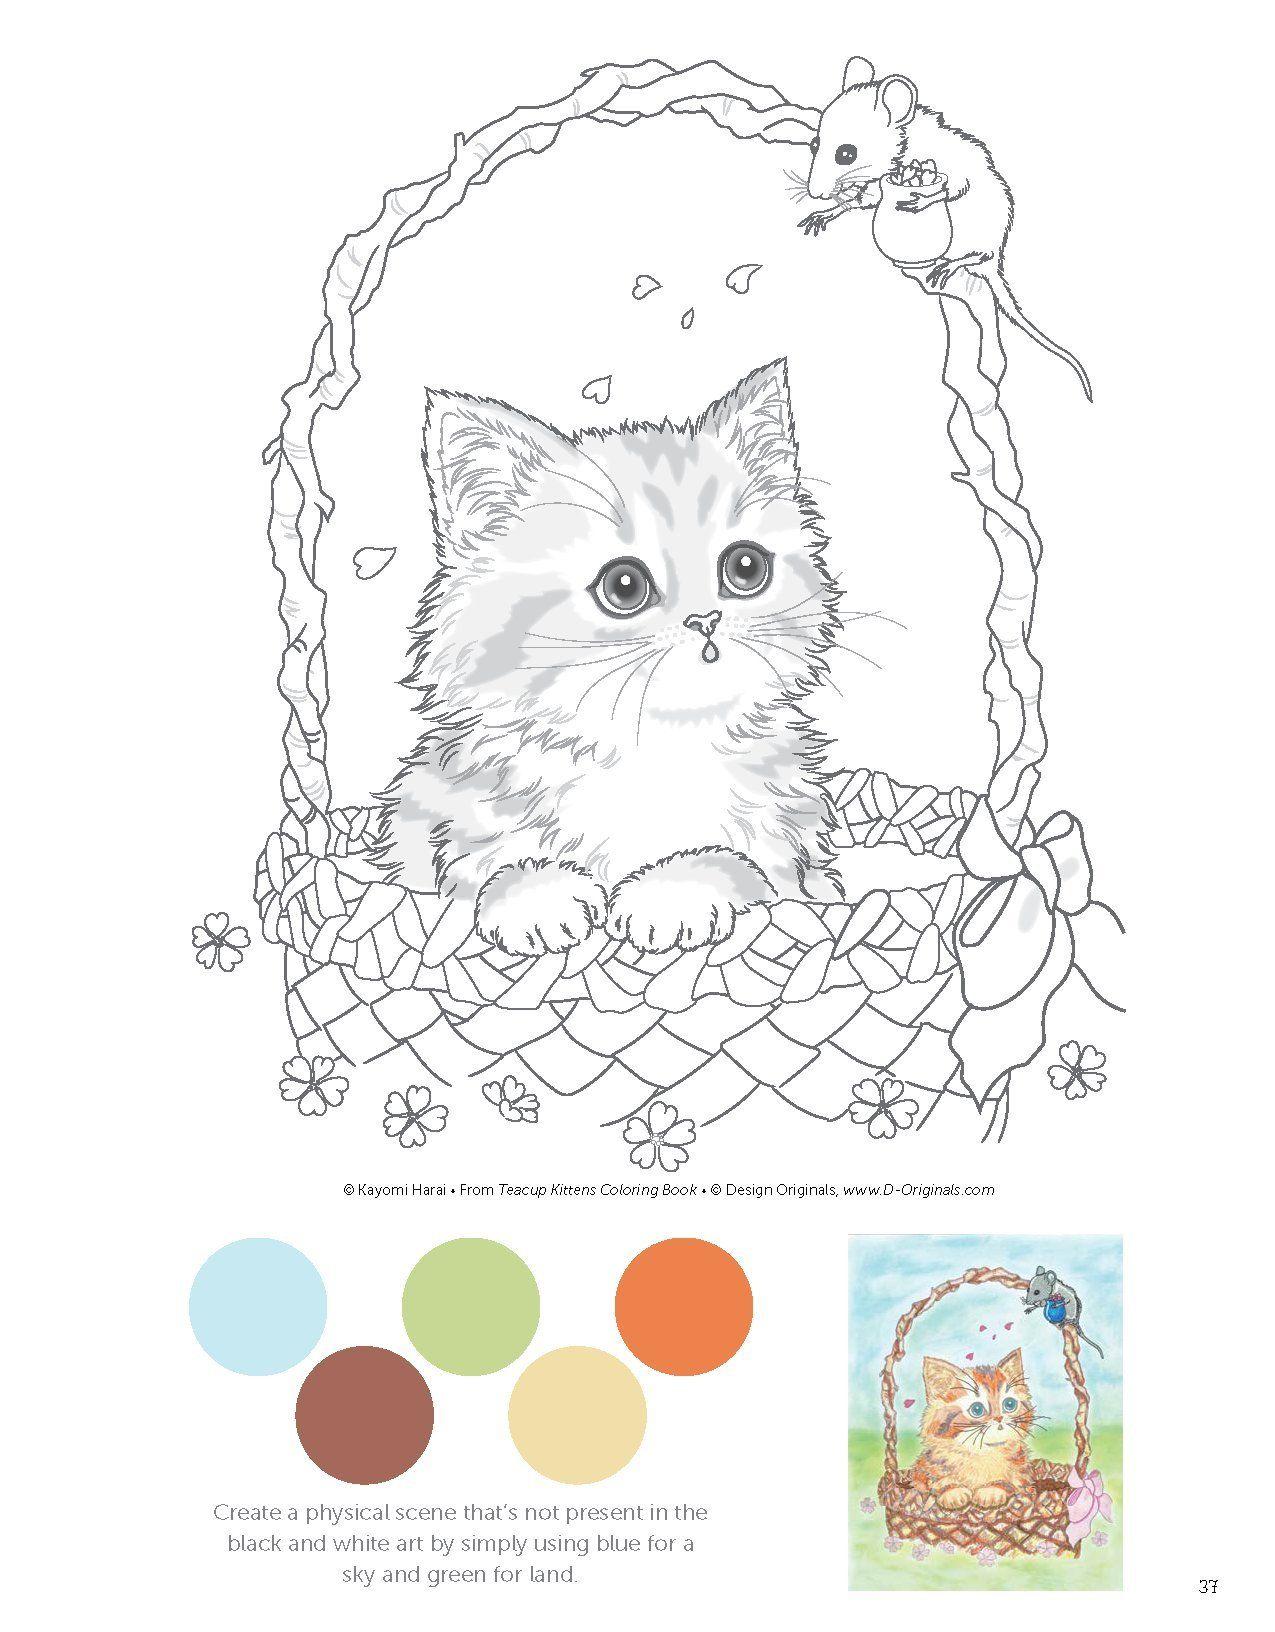 Teacup Kittens Coloring Book Design Originals Kayomi Harai 9781497202269 Amazon Com Books Kittens Coloring Kitten Coloring Book Designs Coloring Books